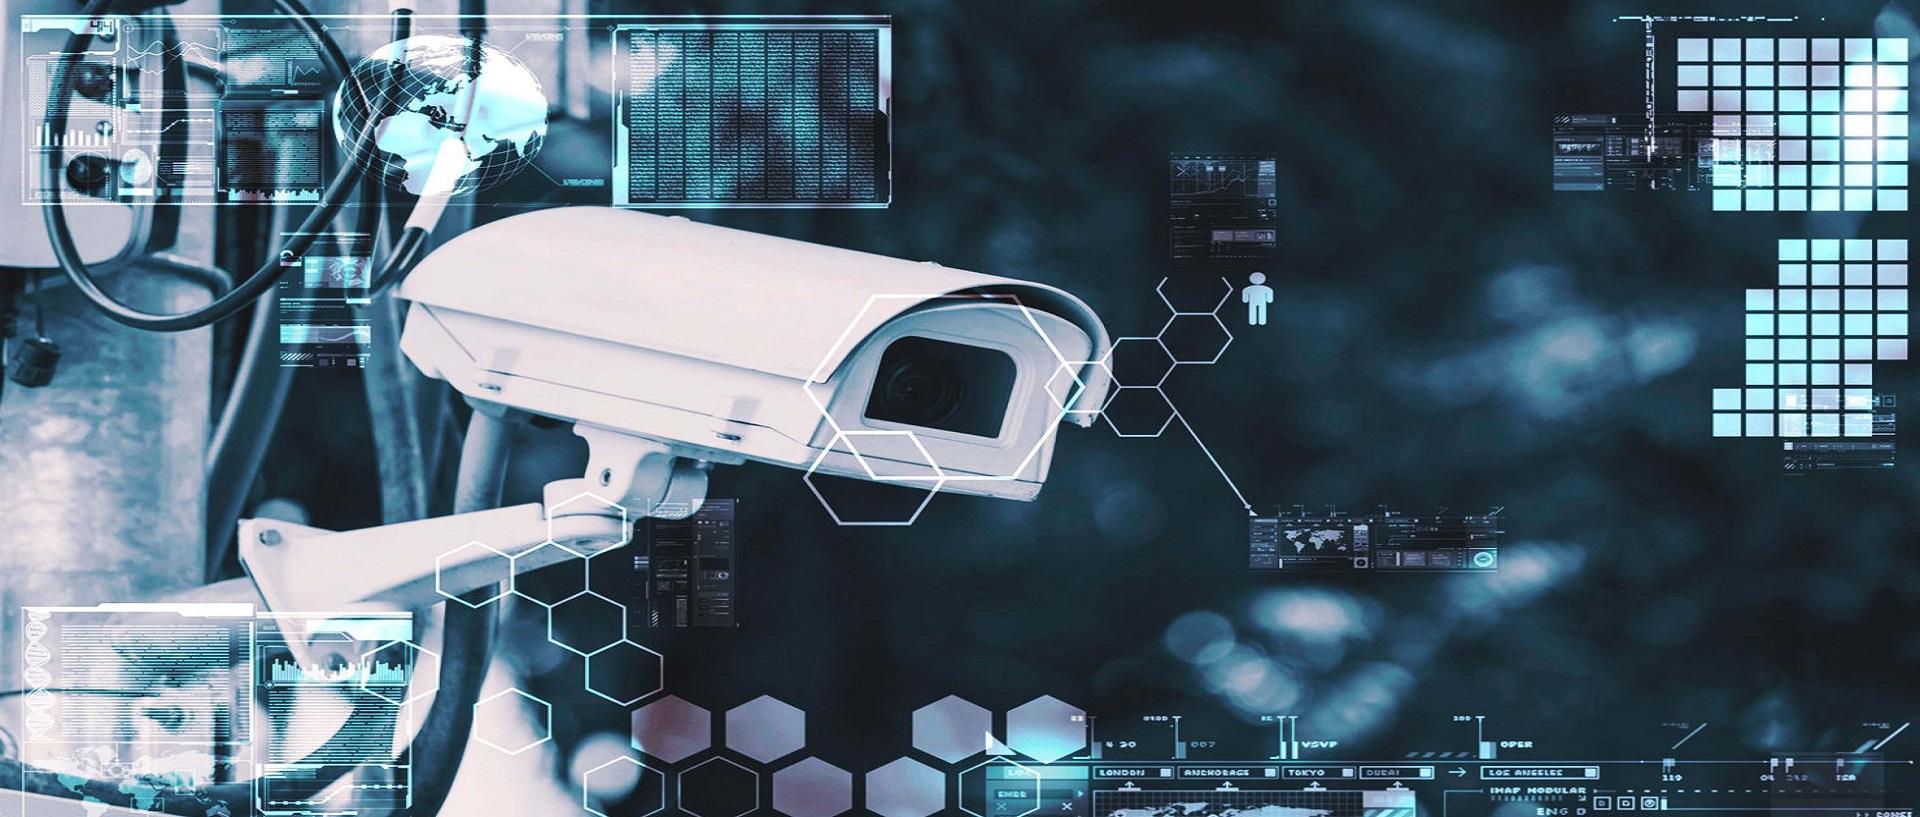 Cadie CCTV camera System